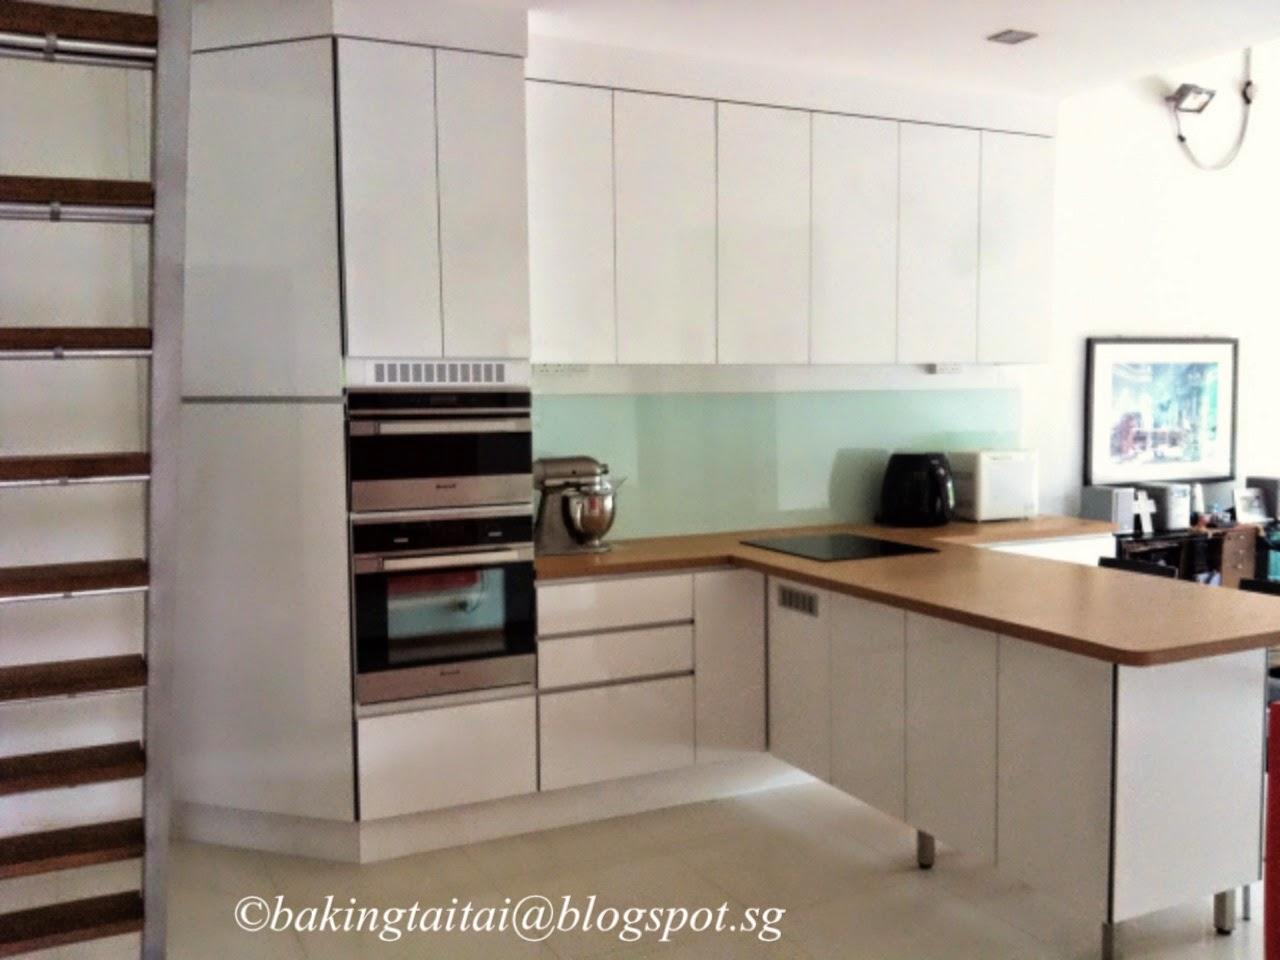 My New Dry Kitchen And Brandt Liances 我的新烘焙乐园和厨房电器